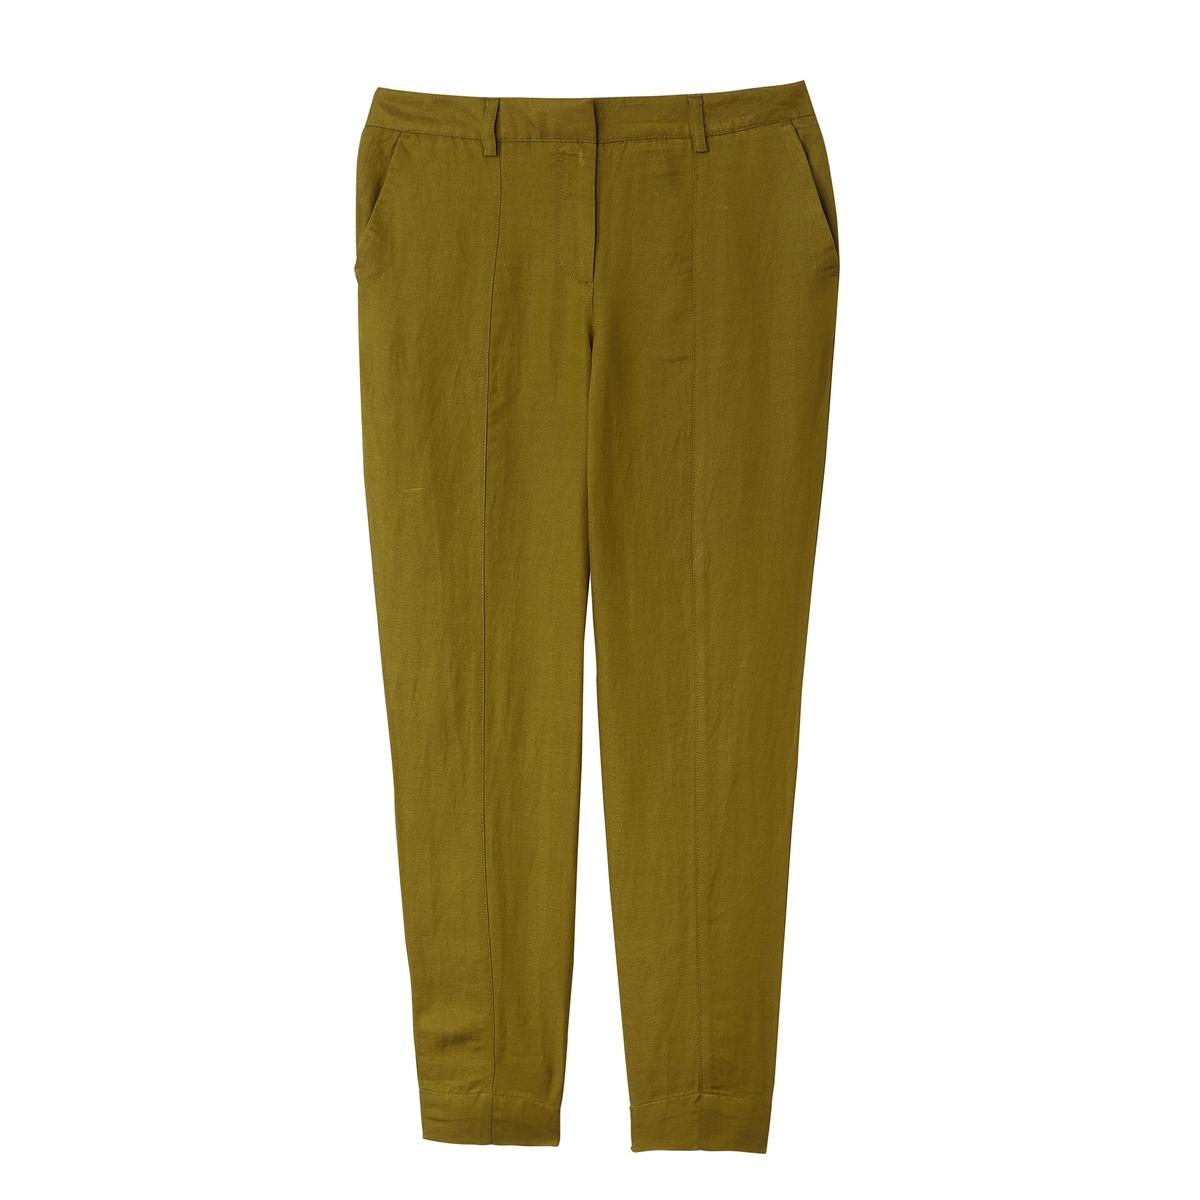 Брюки каррот из льна и вискозы брюки из вискозы loeve